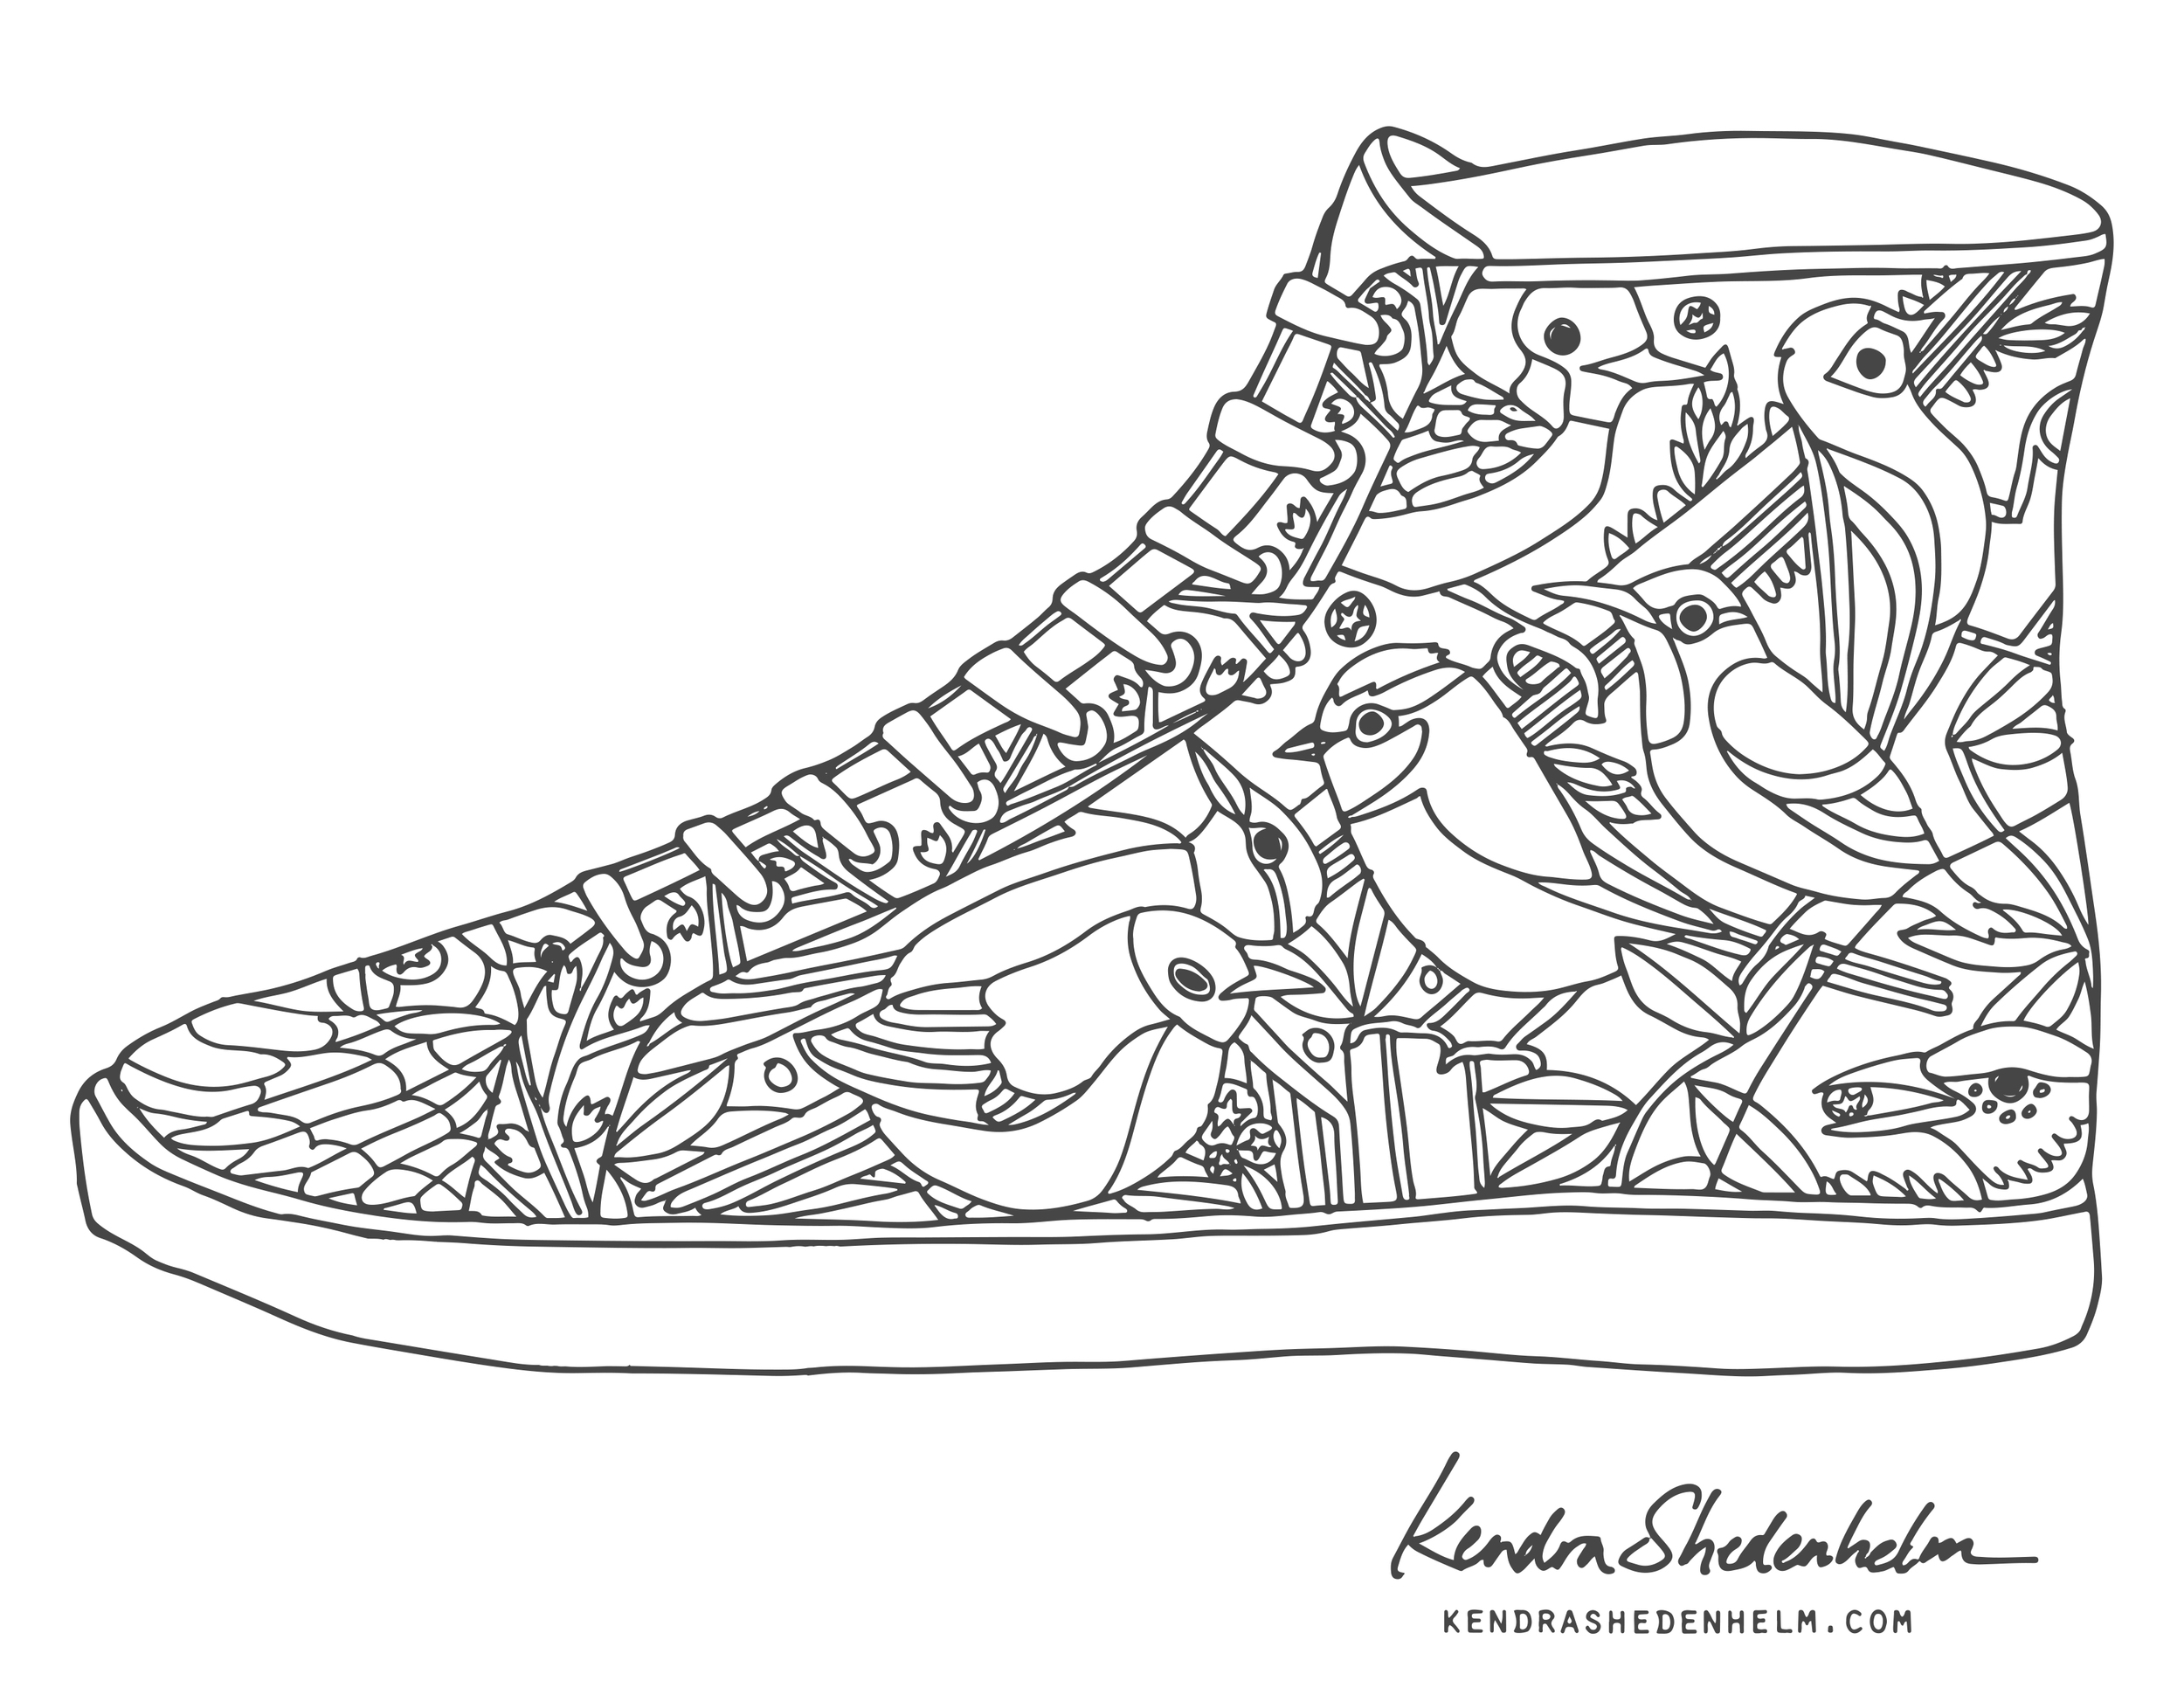 Kendra_Shedenhelm_Coloring-Page_Shoe_Birds2.jpg